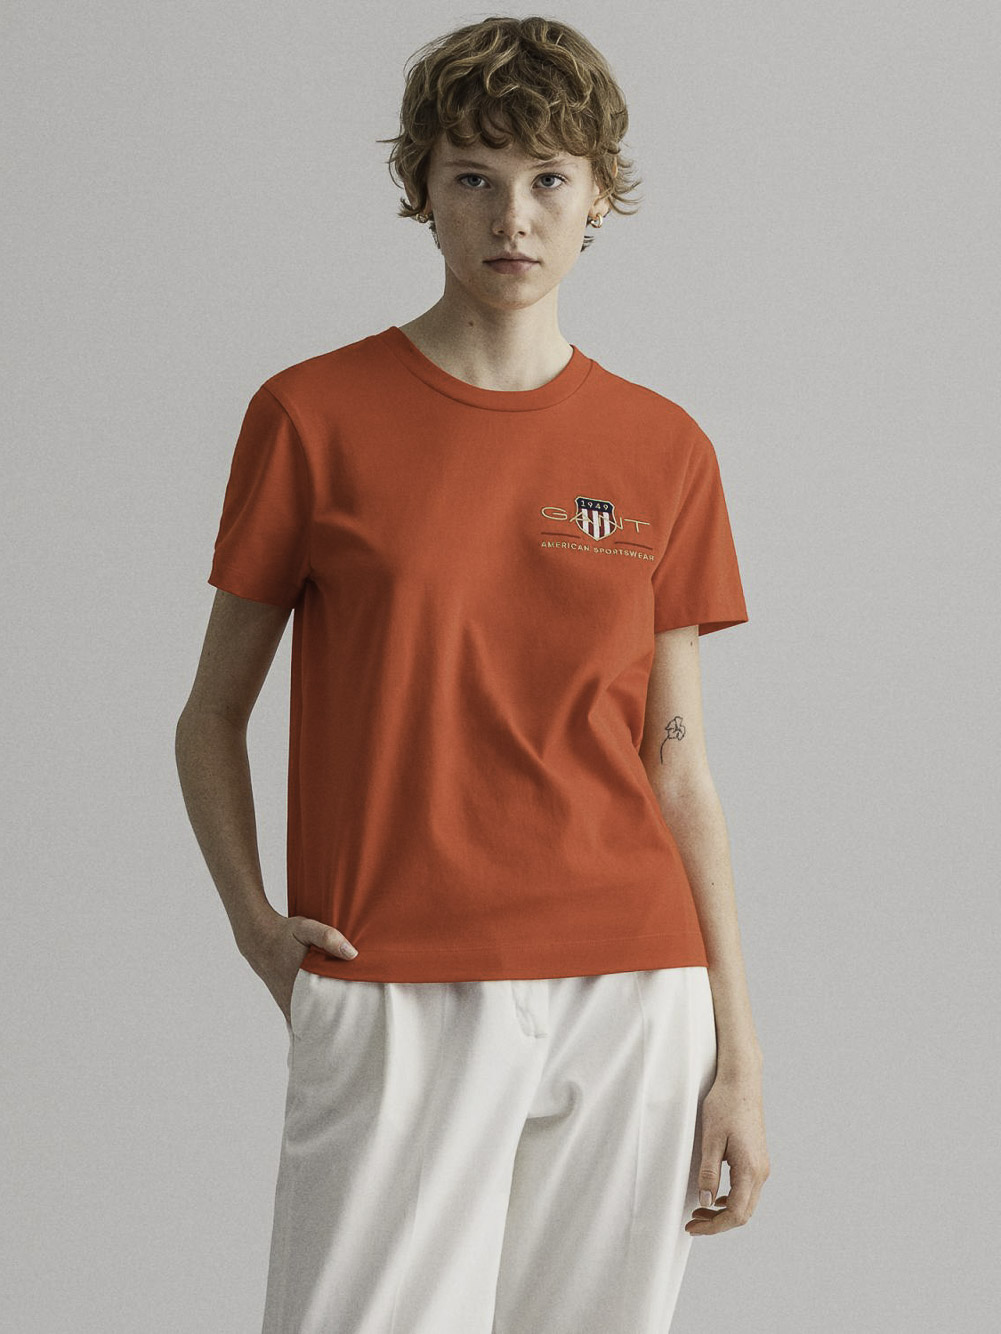 GANT Μπλούζα t-shirt 3GW4200417-667 ΦΟΥΞΙΑ